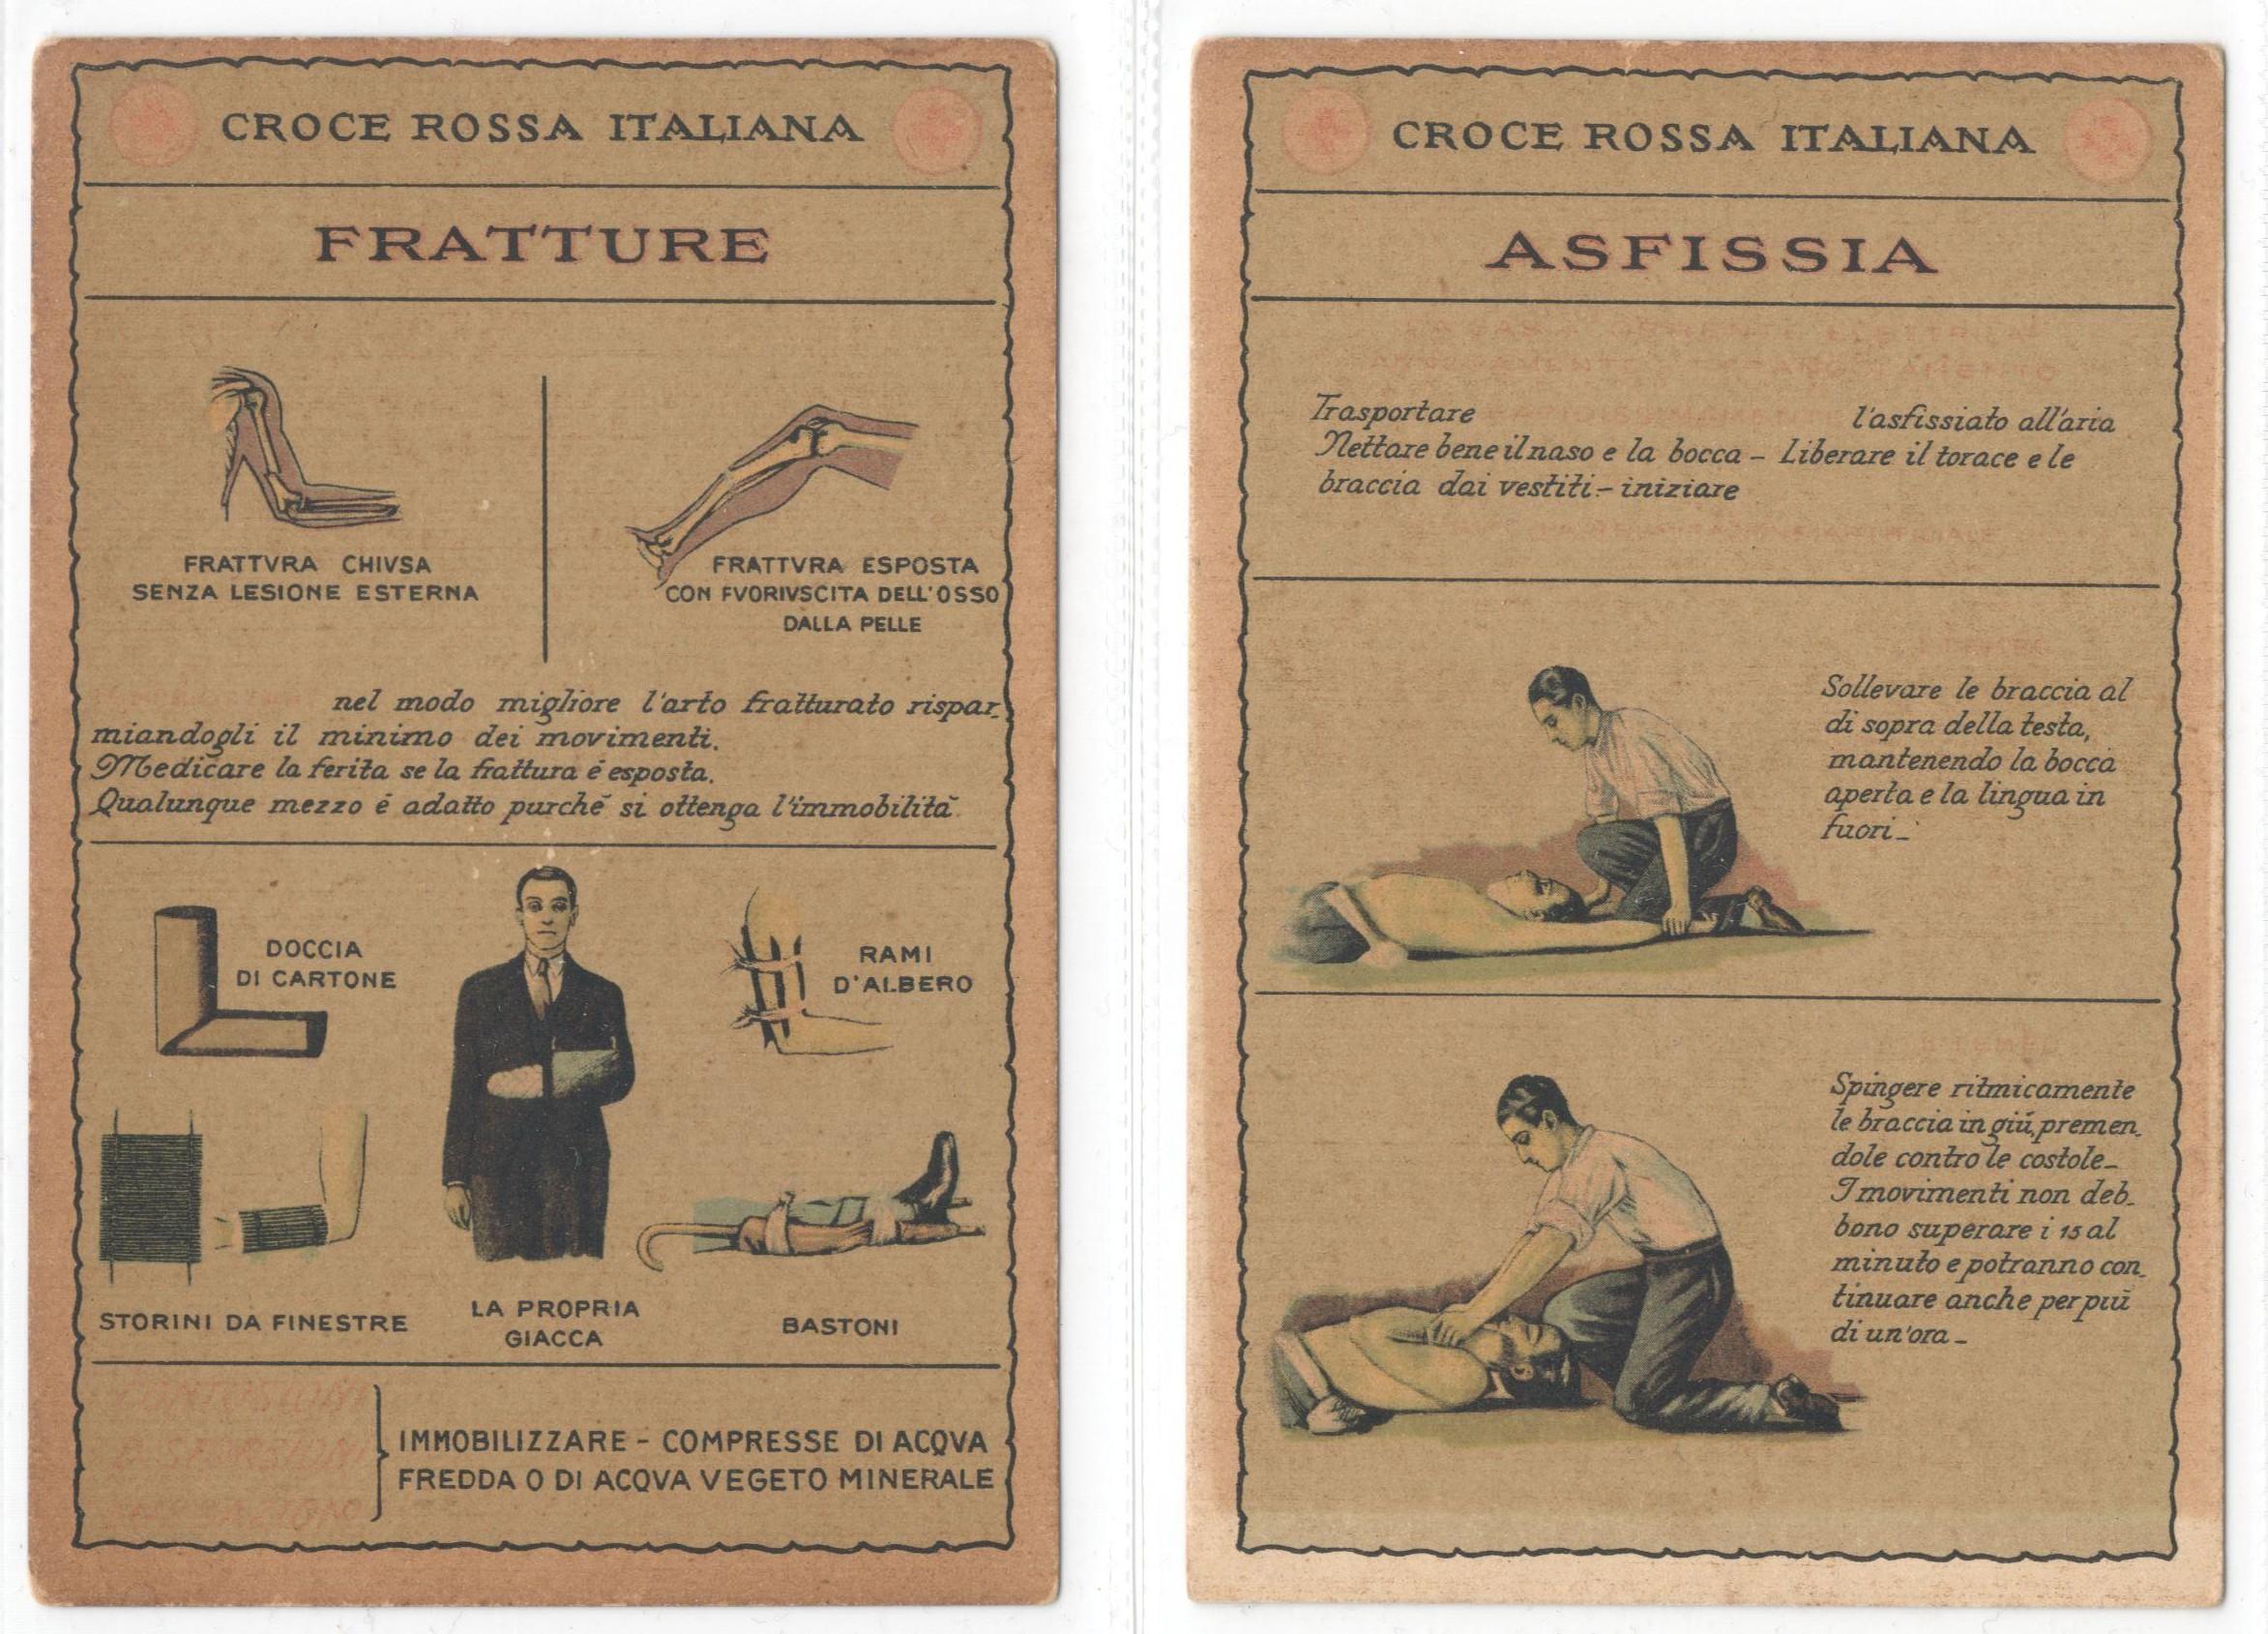 Lot 8 - TWO VINTAGE ITALIAN RED CROSS POSTCARDS - CROCE ROSSA ITALIANA FRATTURE & ASFISSIA